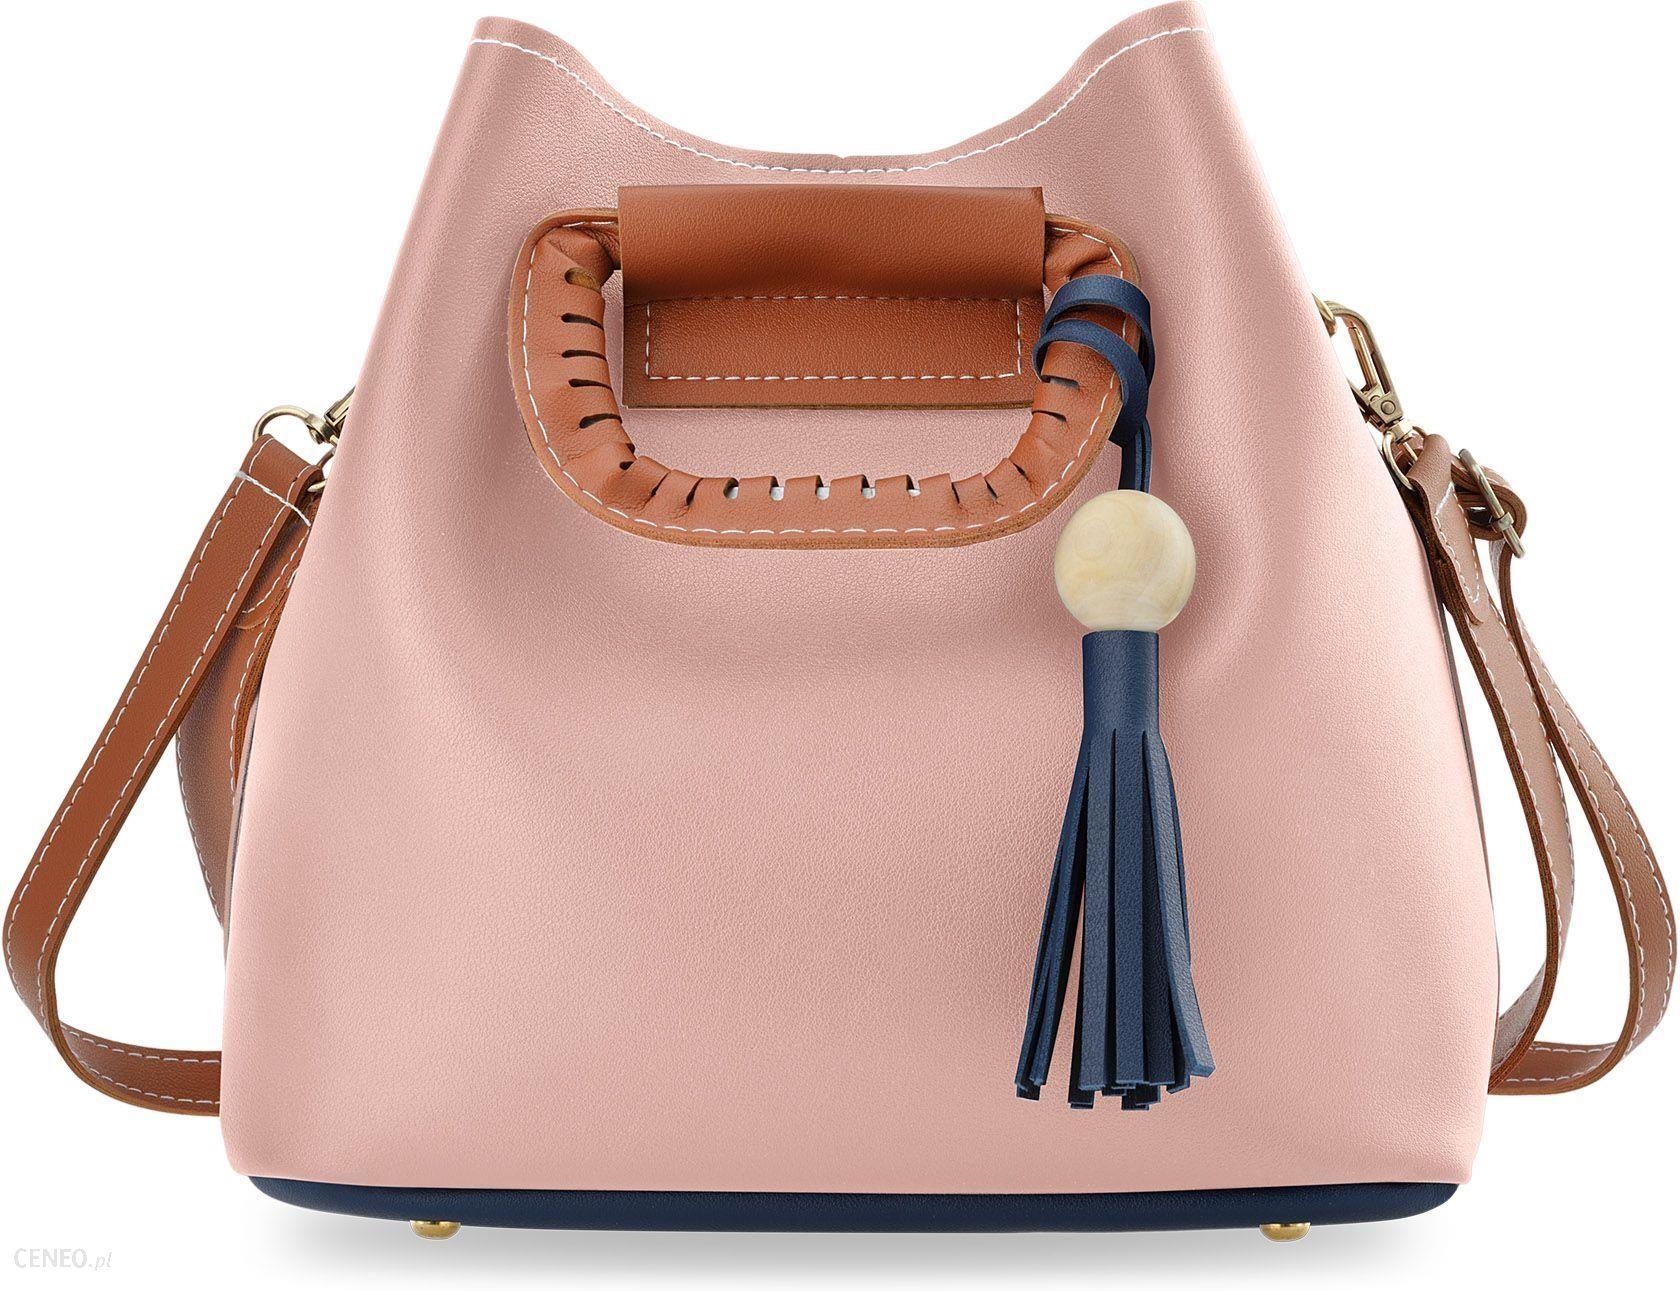 95027991022b2 Kolorowa shopperka torebka damska typu sakwa worek do ręki i na ramię -  granatowo-różowa